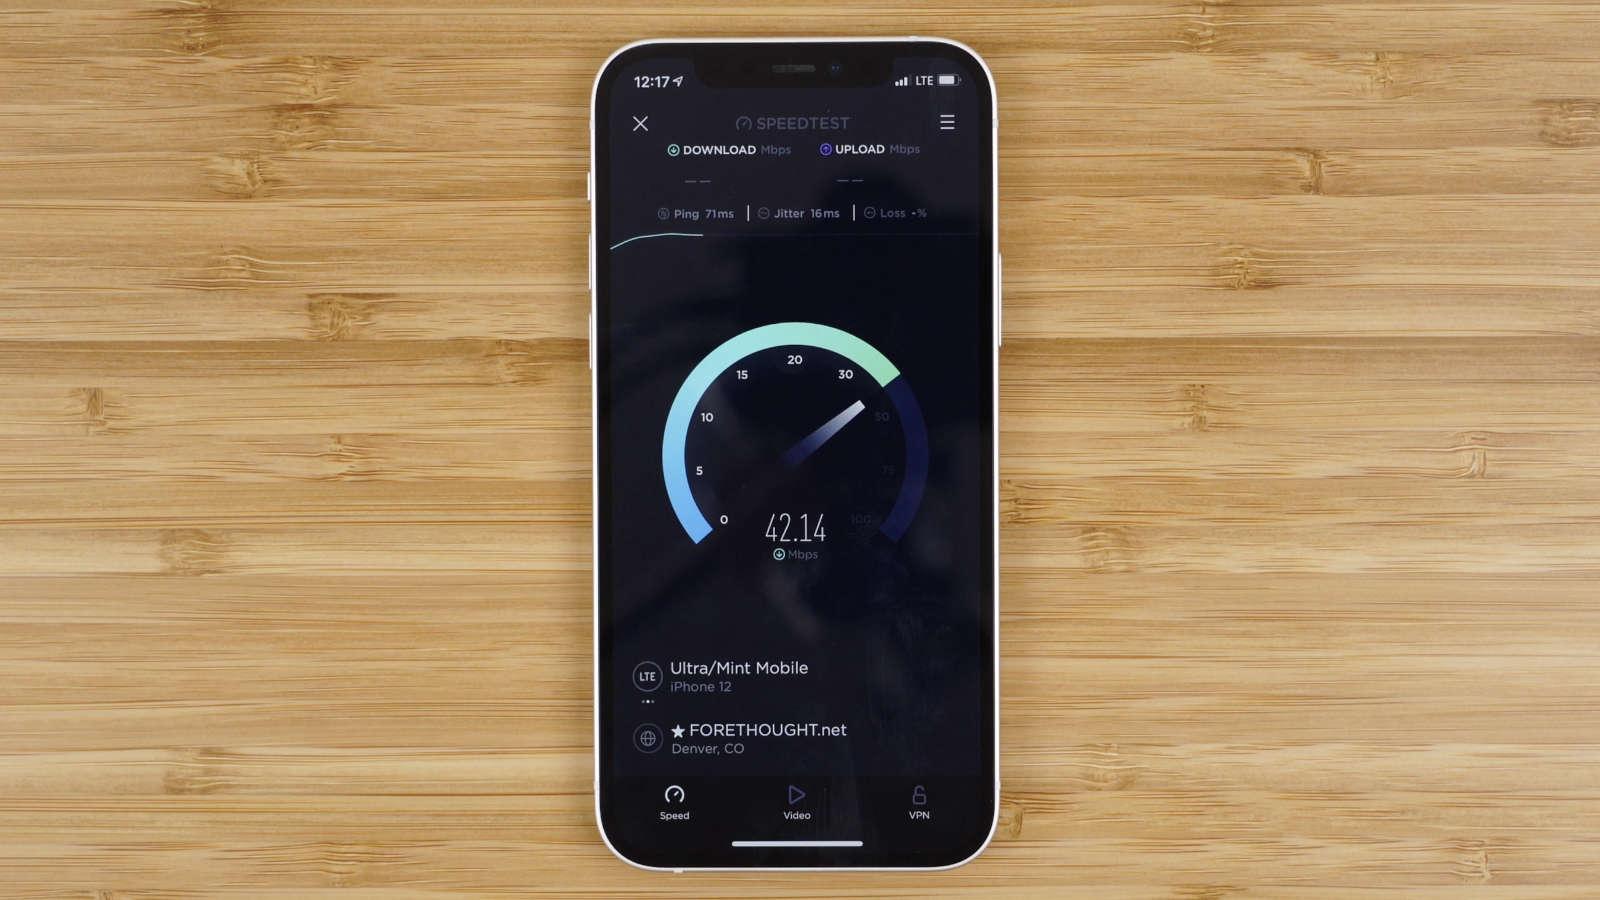 iPhone running cellular data speed test using Ookla's speedtest application